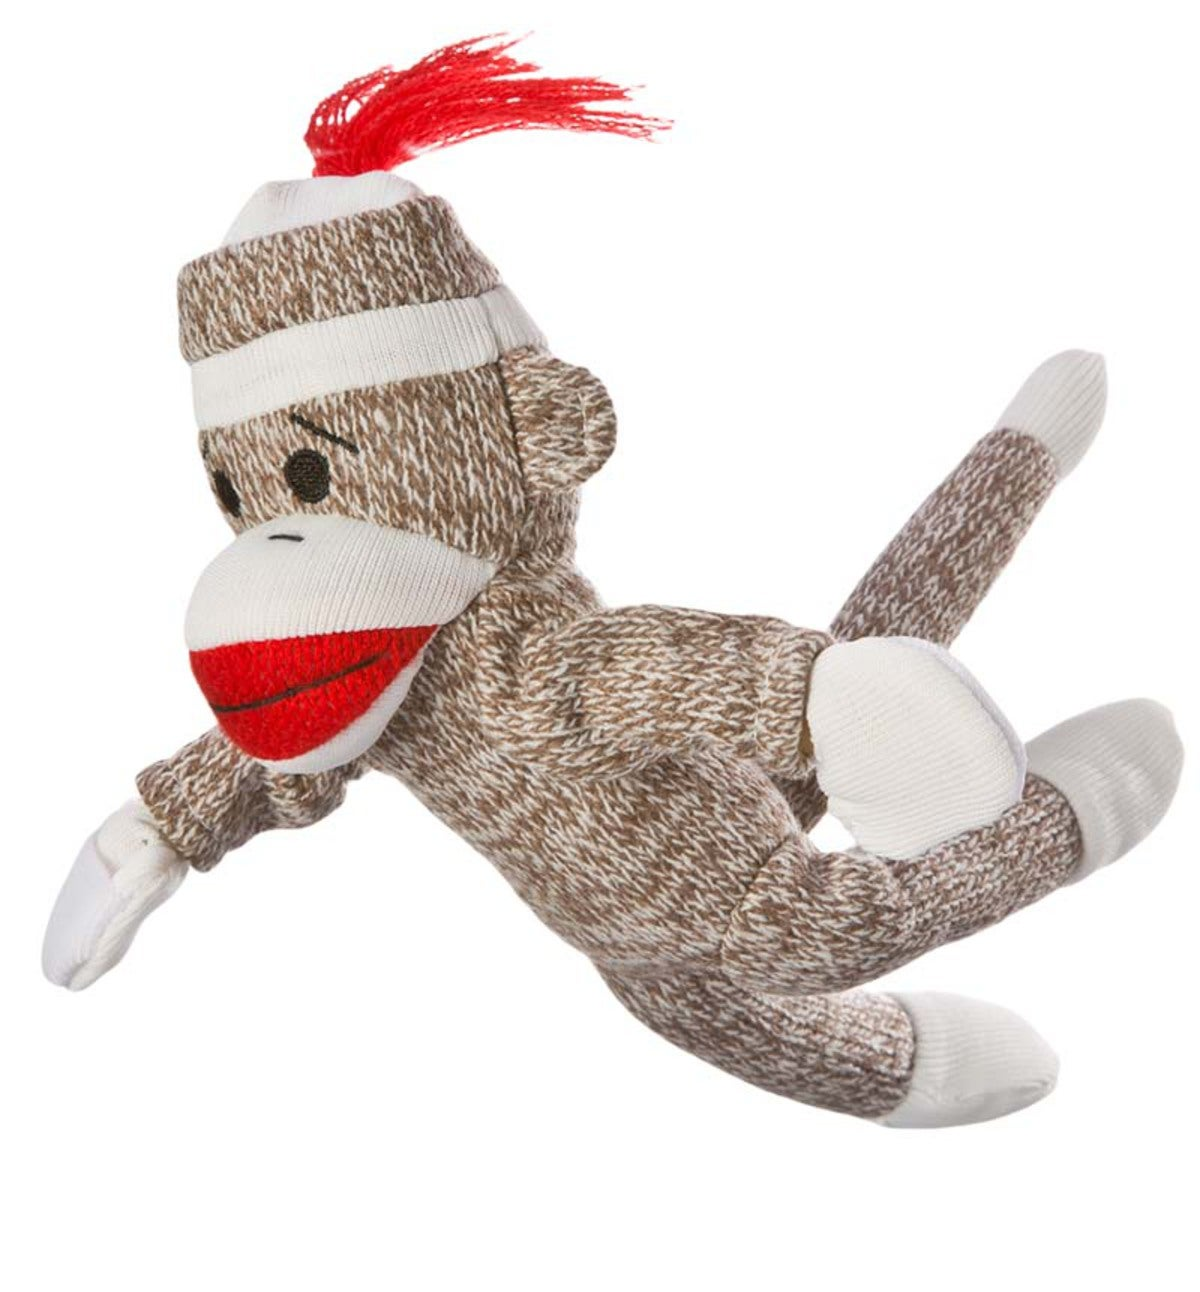 Sock Monkey Flying Screaming Slingshot Toy | PlowHearth